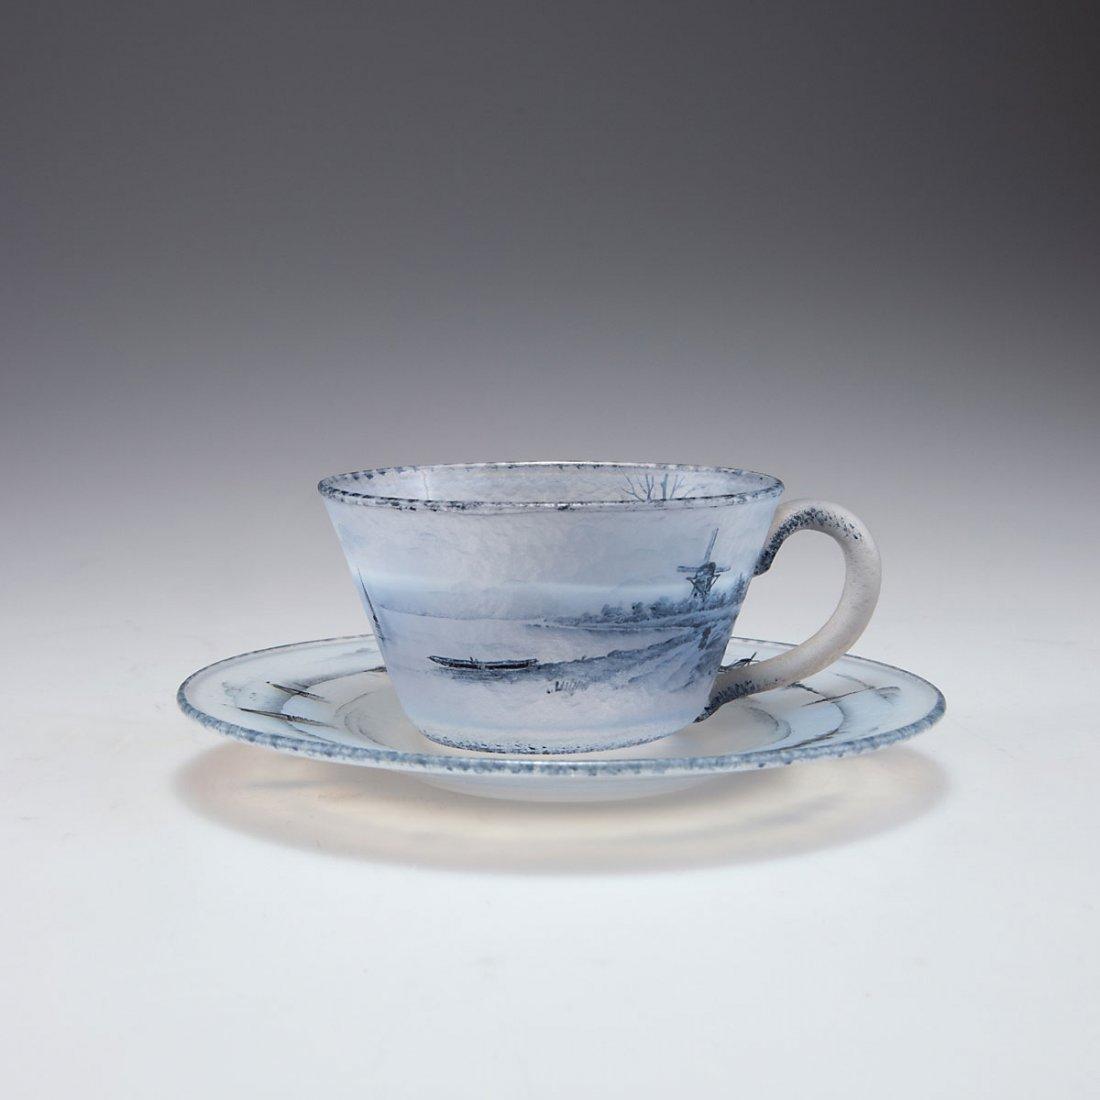 Daum Freres, Nancy. 'Delft' cup and saucer, c1899. H.